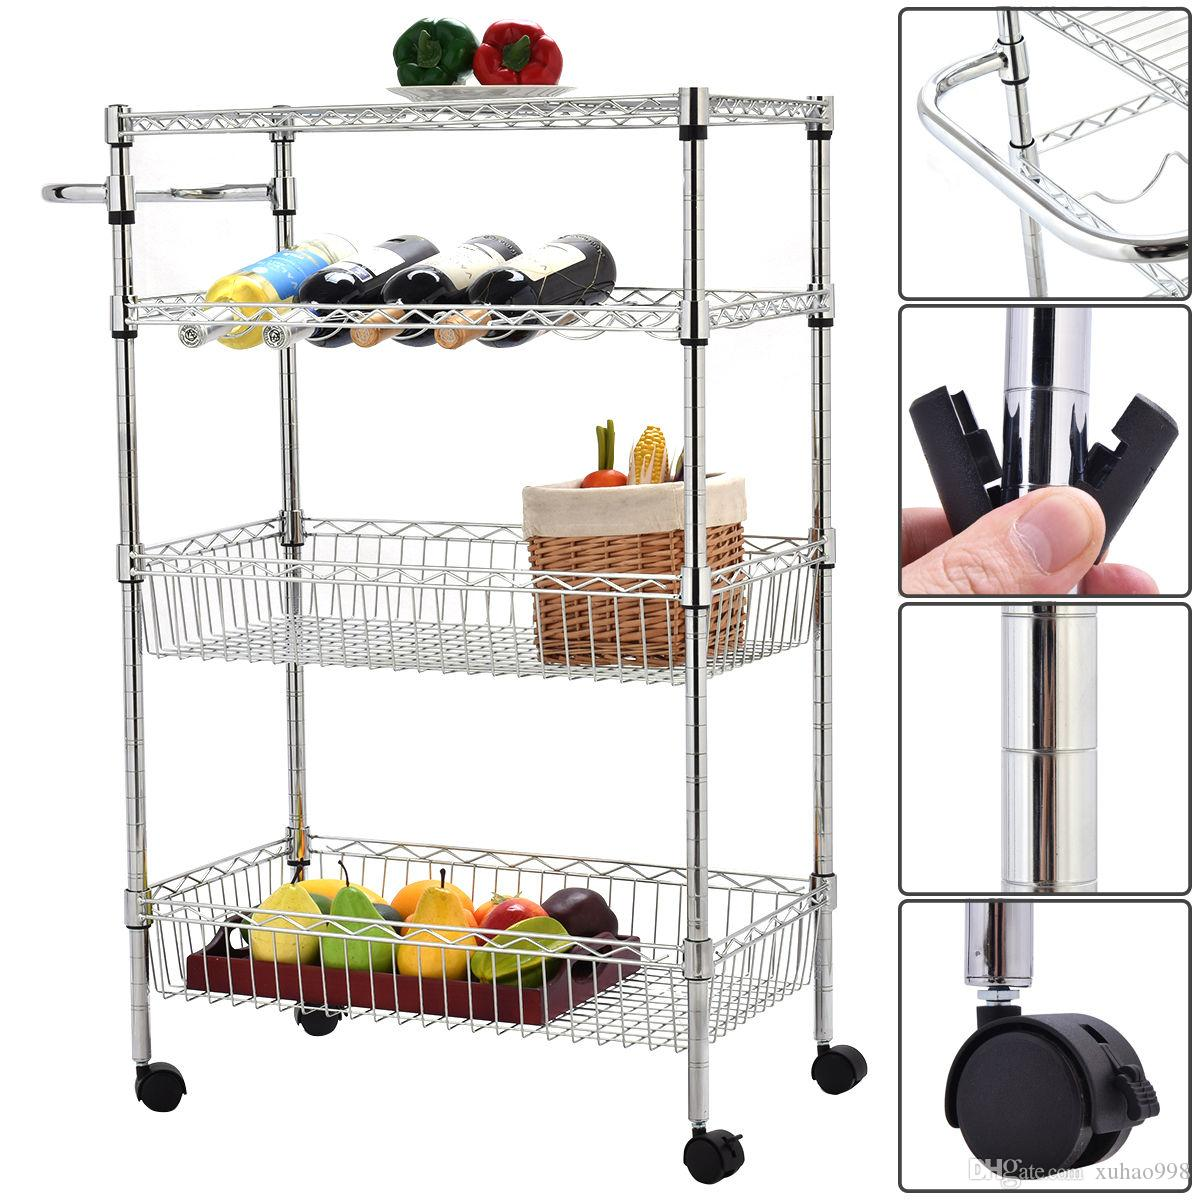 2019 4 Tier Rolling Steel Kitchen Trolley Cart Island Wire Rack Shelf Stand  2 Baskets From Xuhao998, $32.12 | DHgate.Com